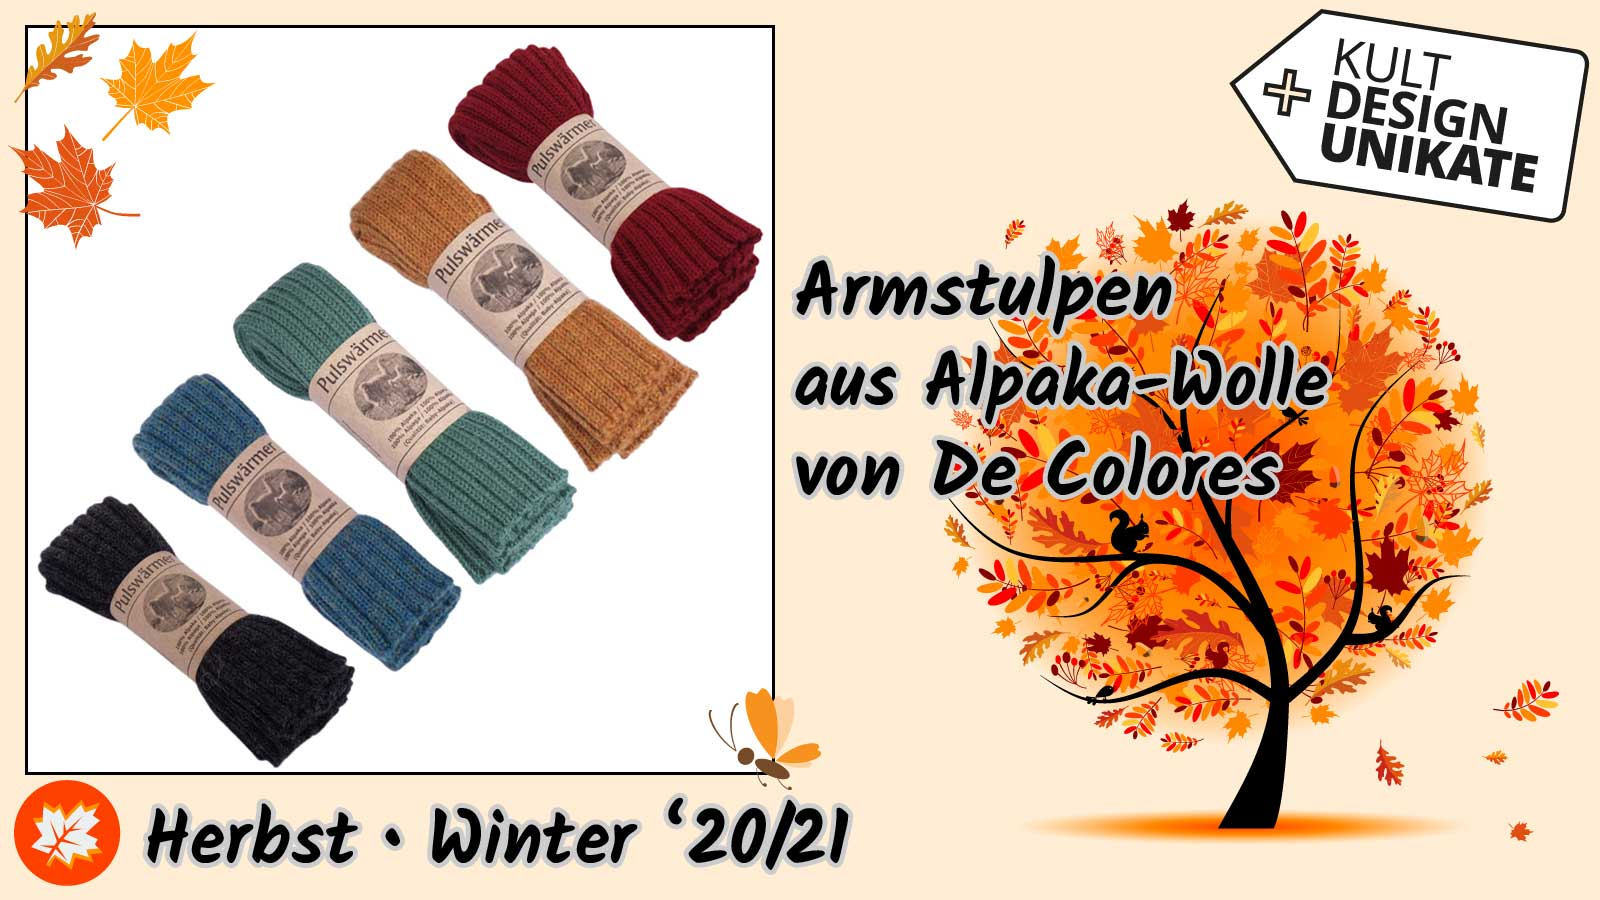 De-Colores-Alpaka